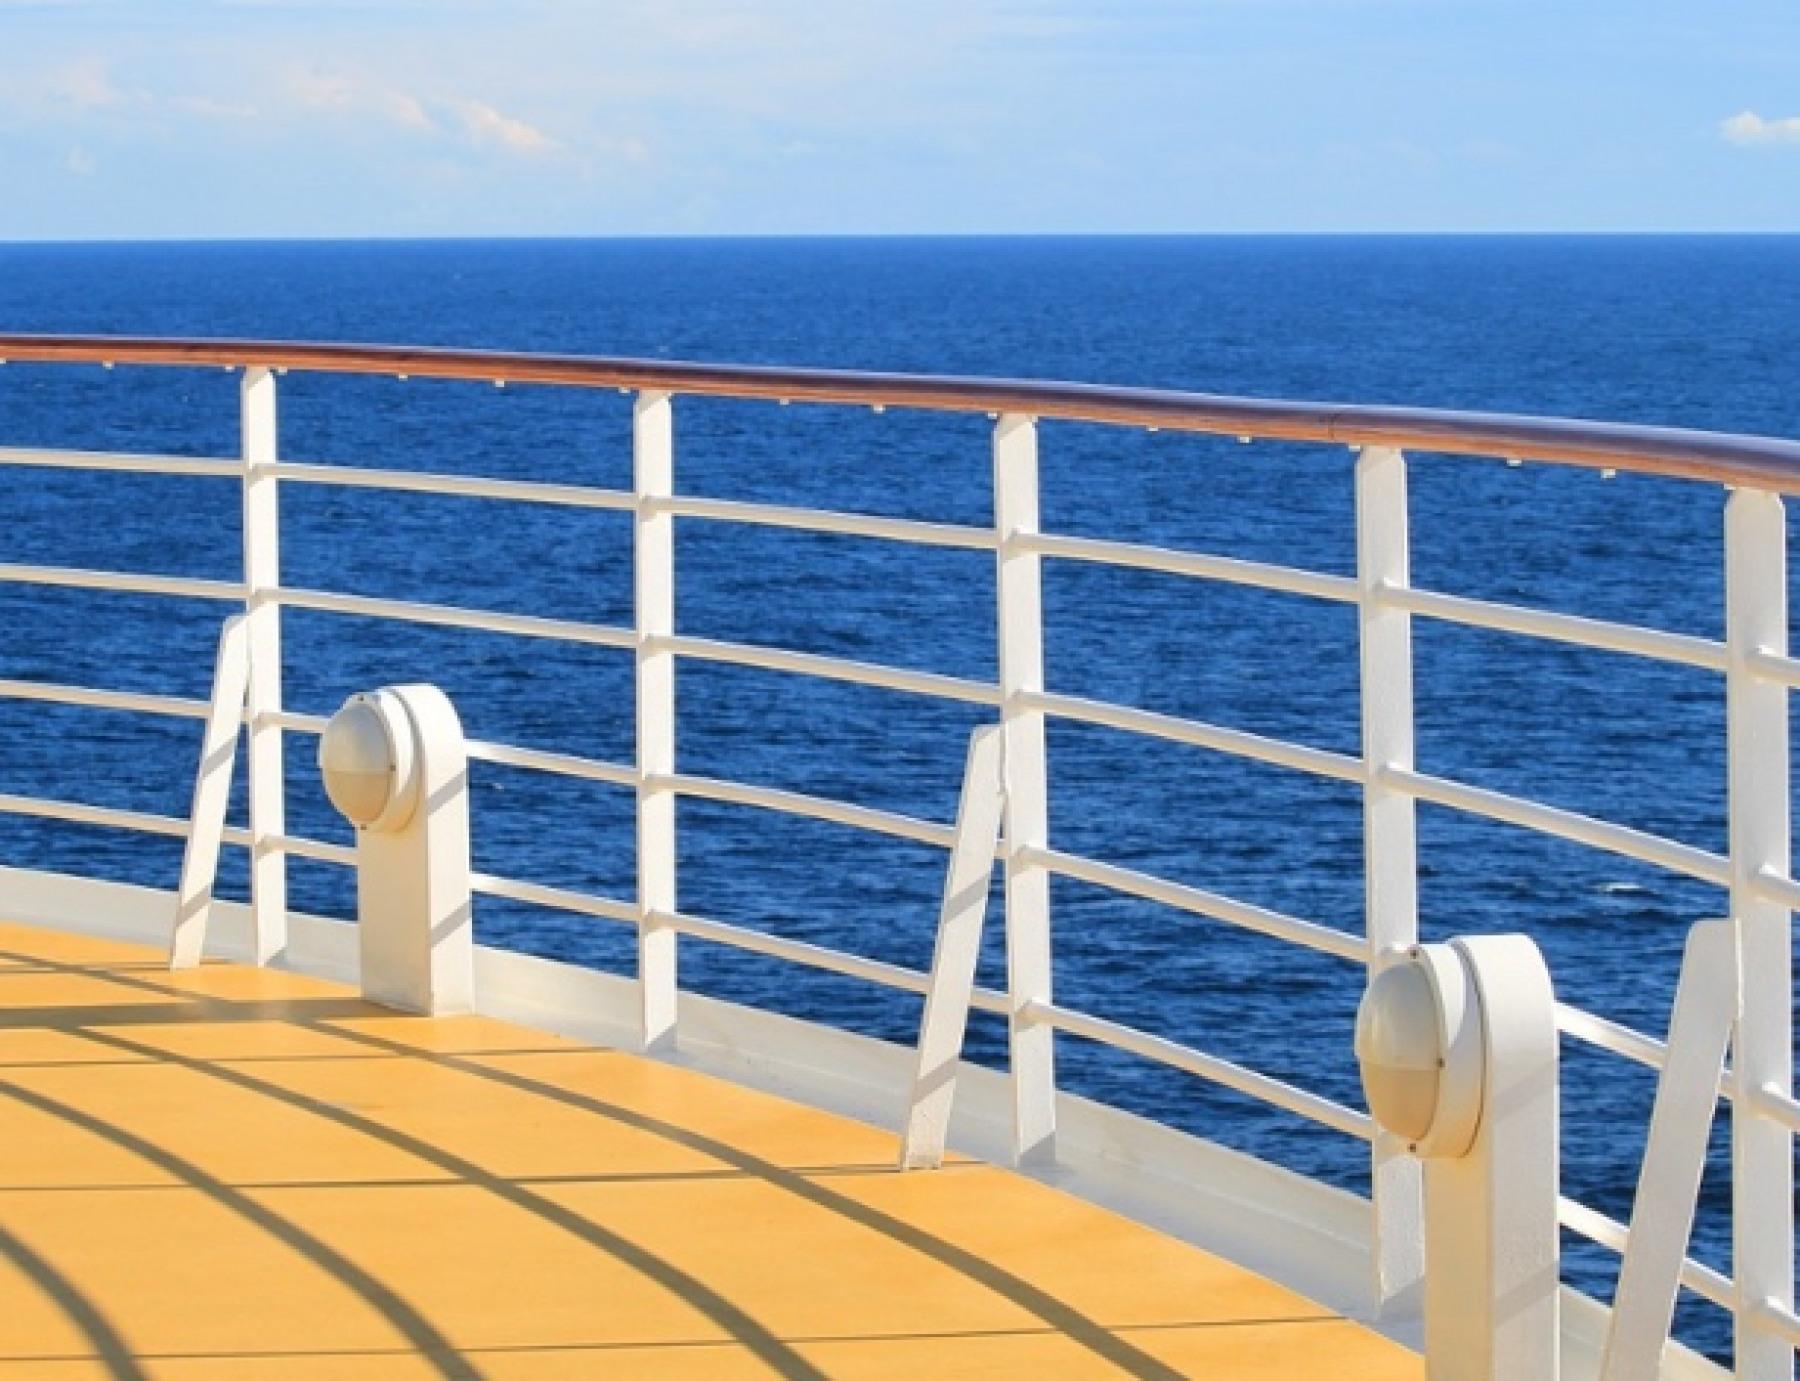 Carnival Valor cruise-the-vineyards-1.jpg